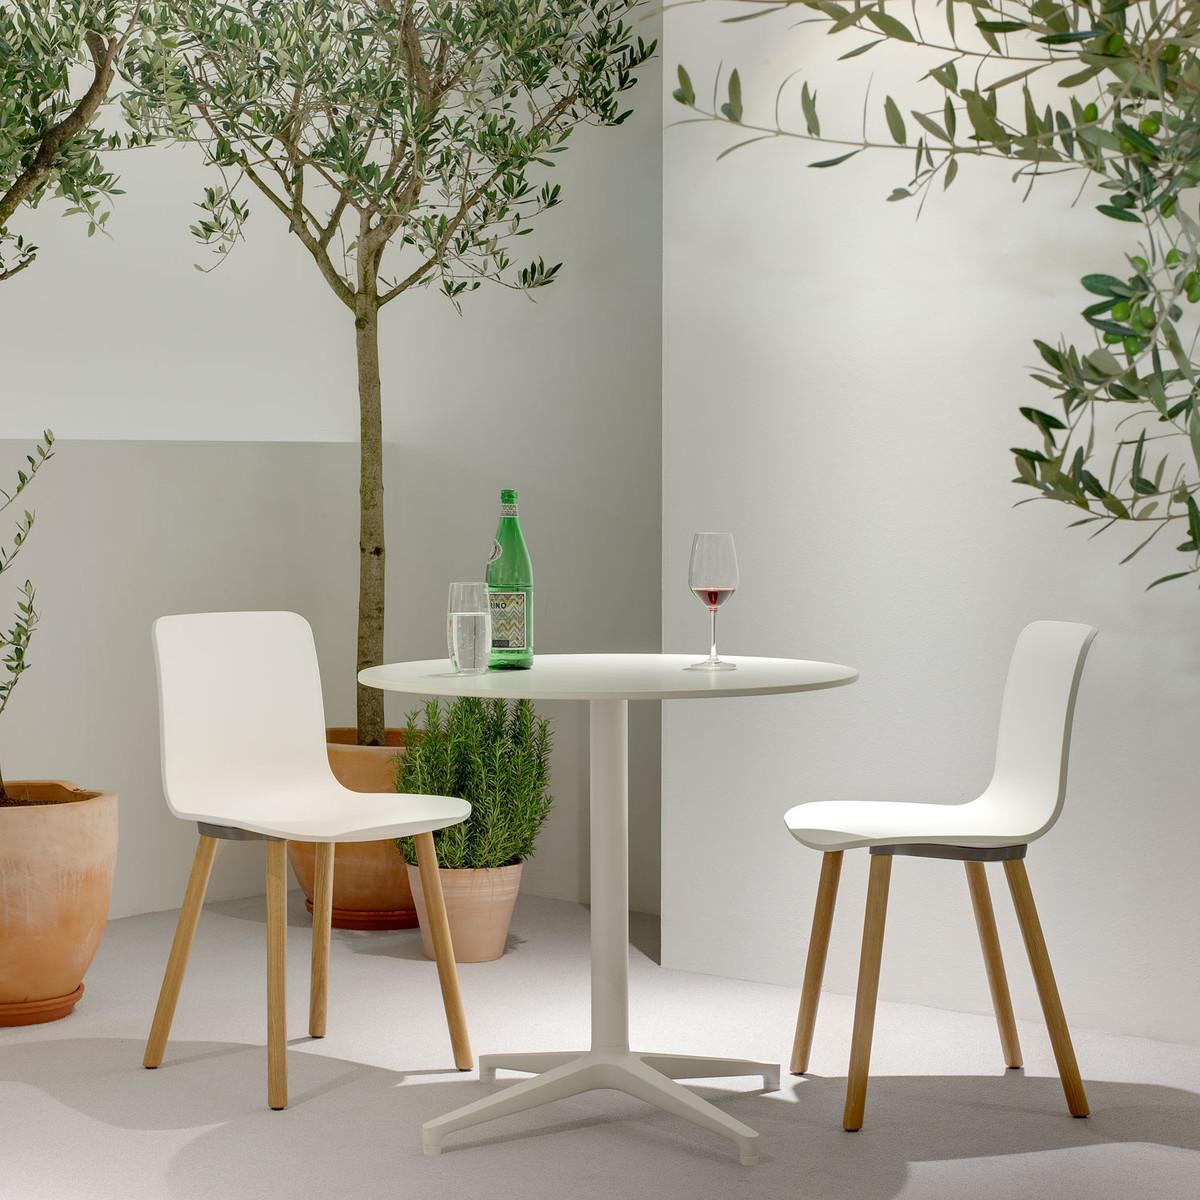 Hal wood stuhl von vitra connox shop for Jugendzimmer stuhl